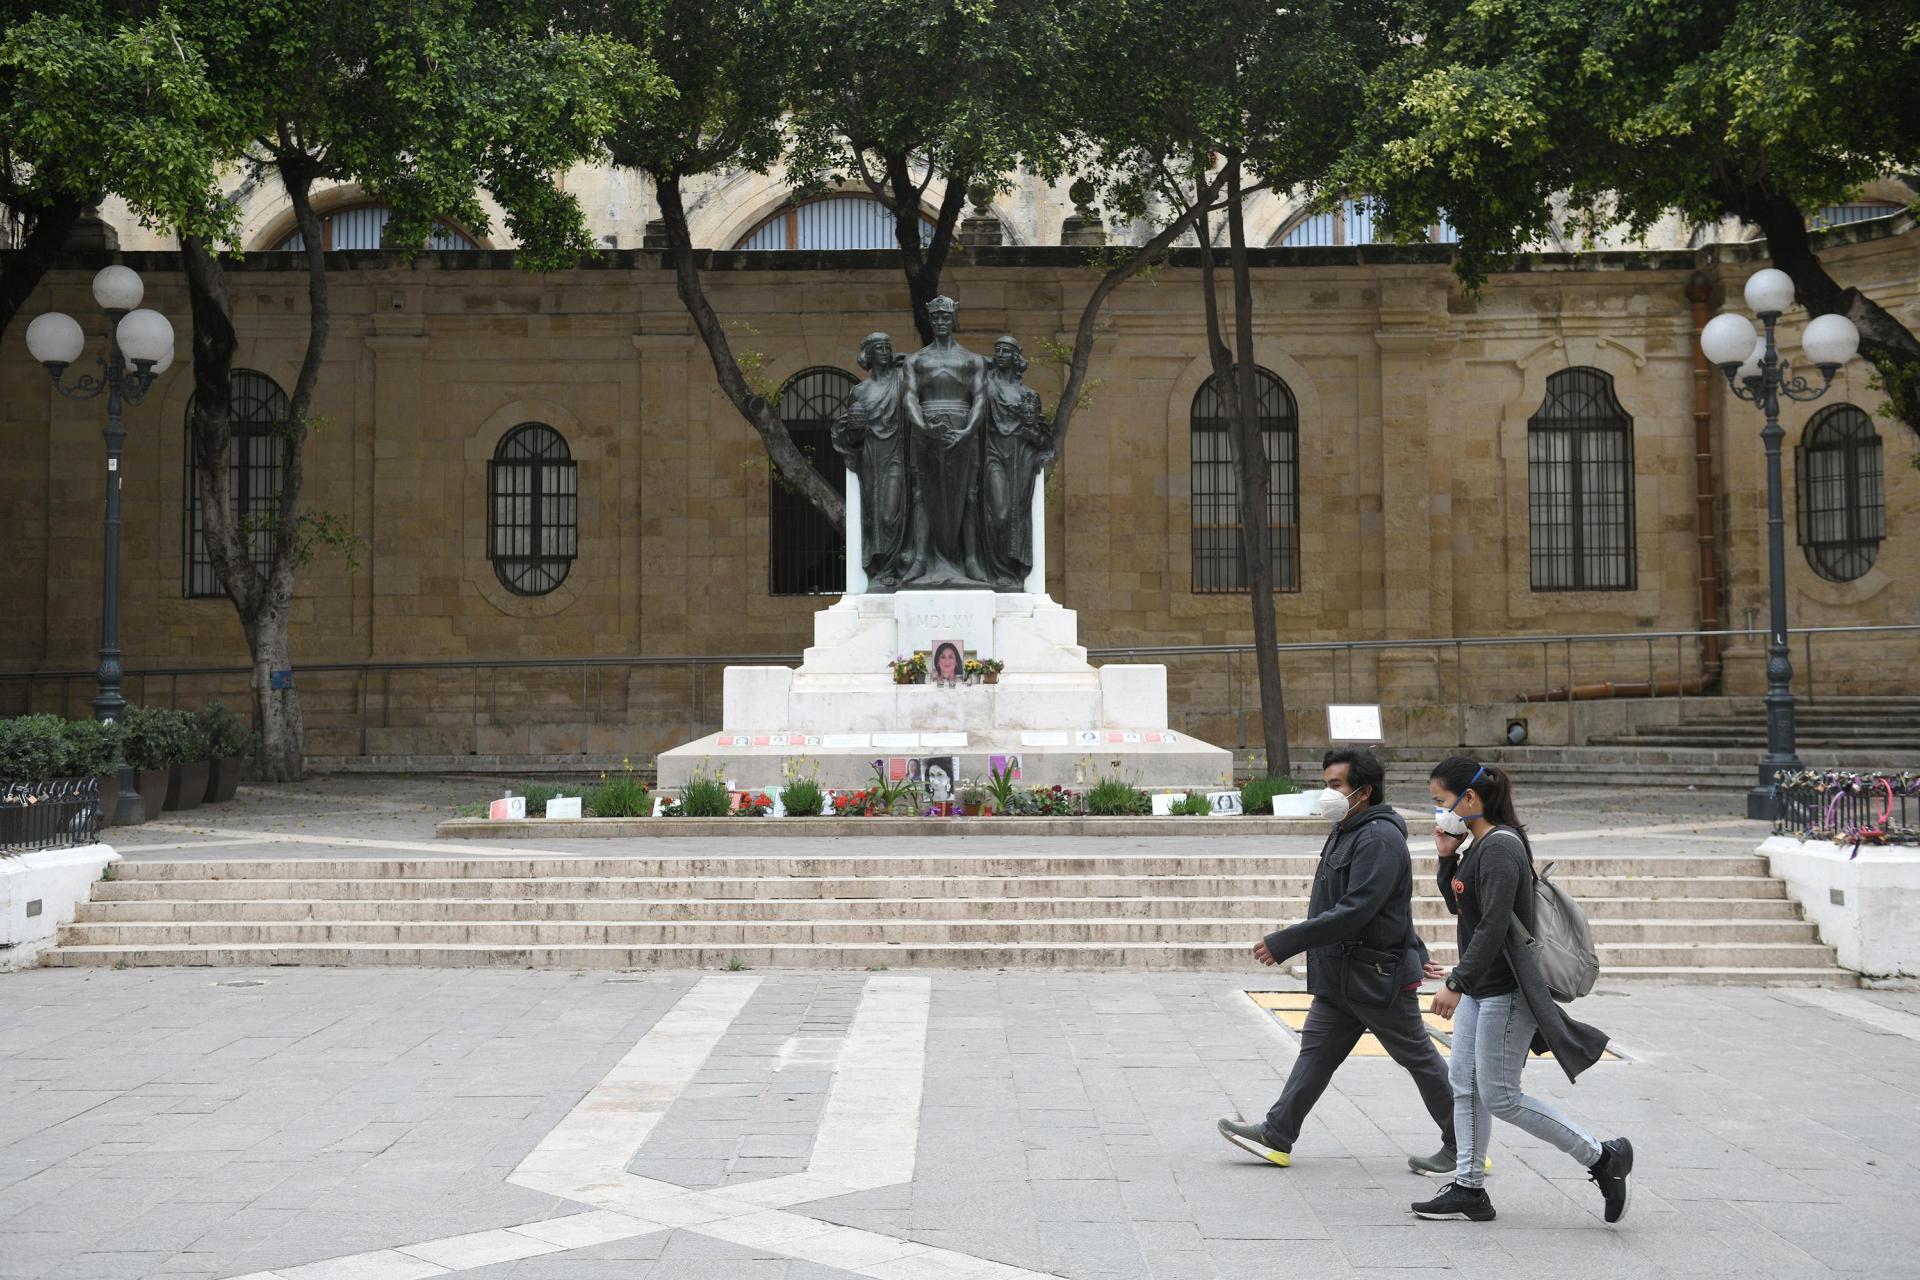 People walk past Daphne Caruana Galizia's mural in Valletta earlier this week. Photo: Matthew Mirabelli